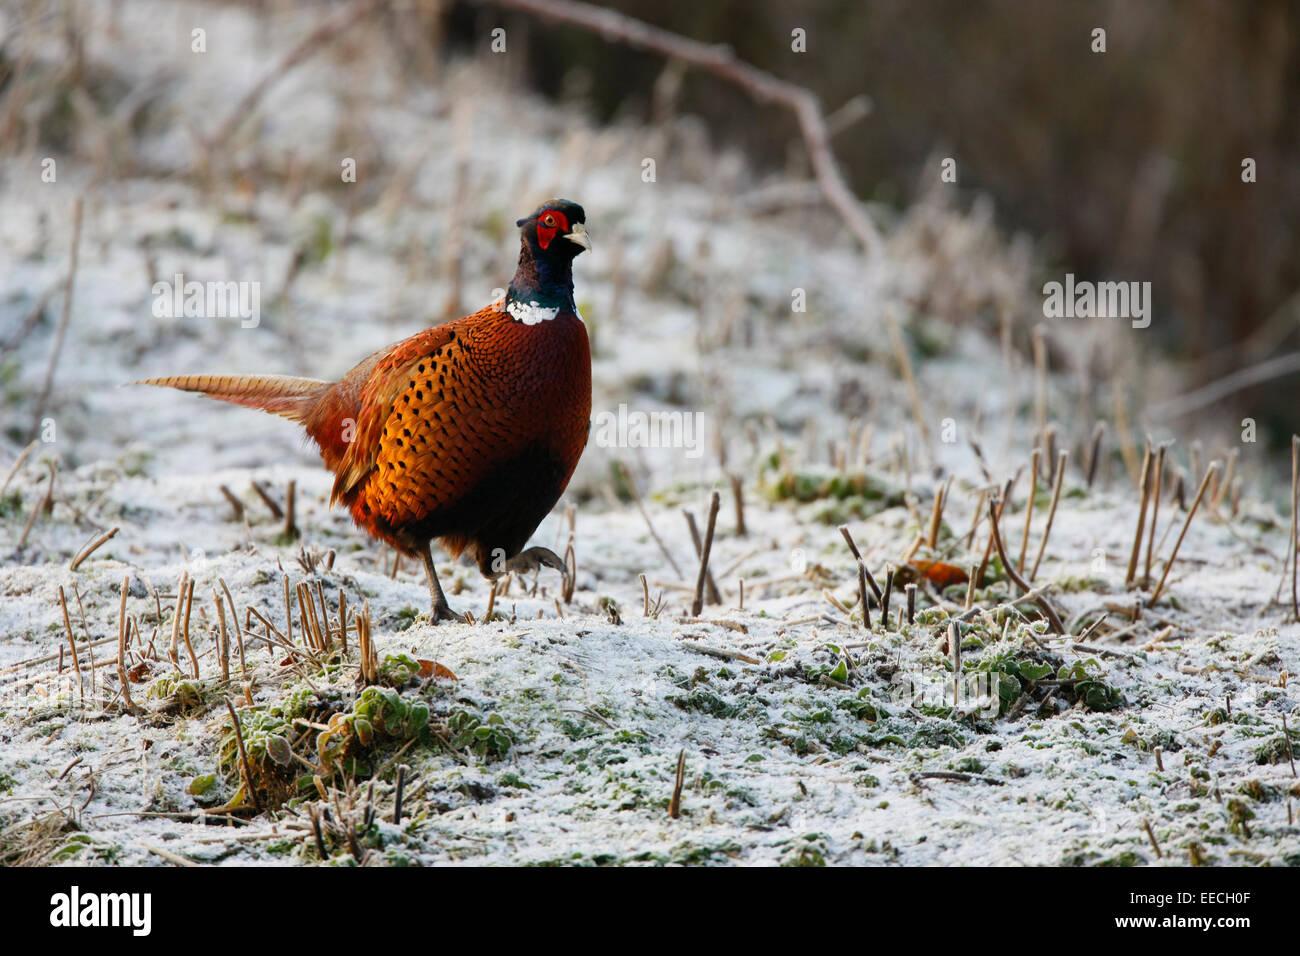 Pheasant - Stock Image